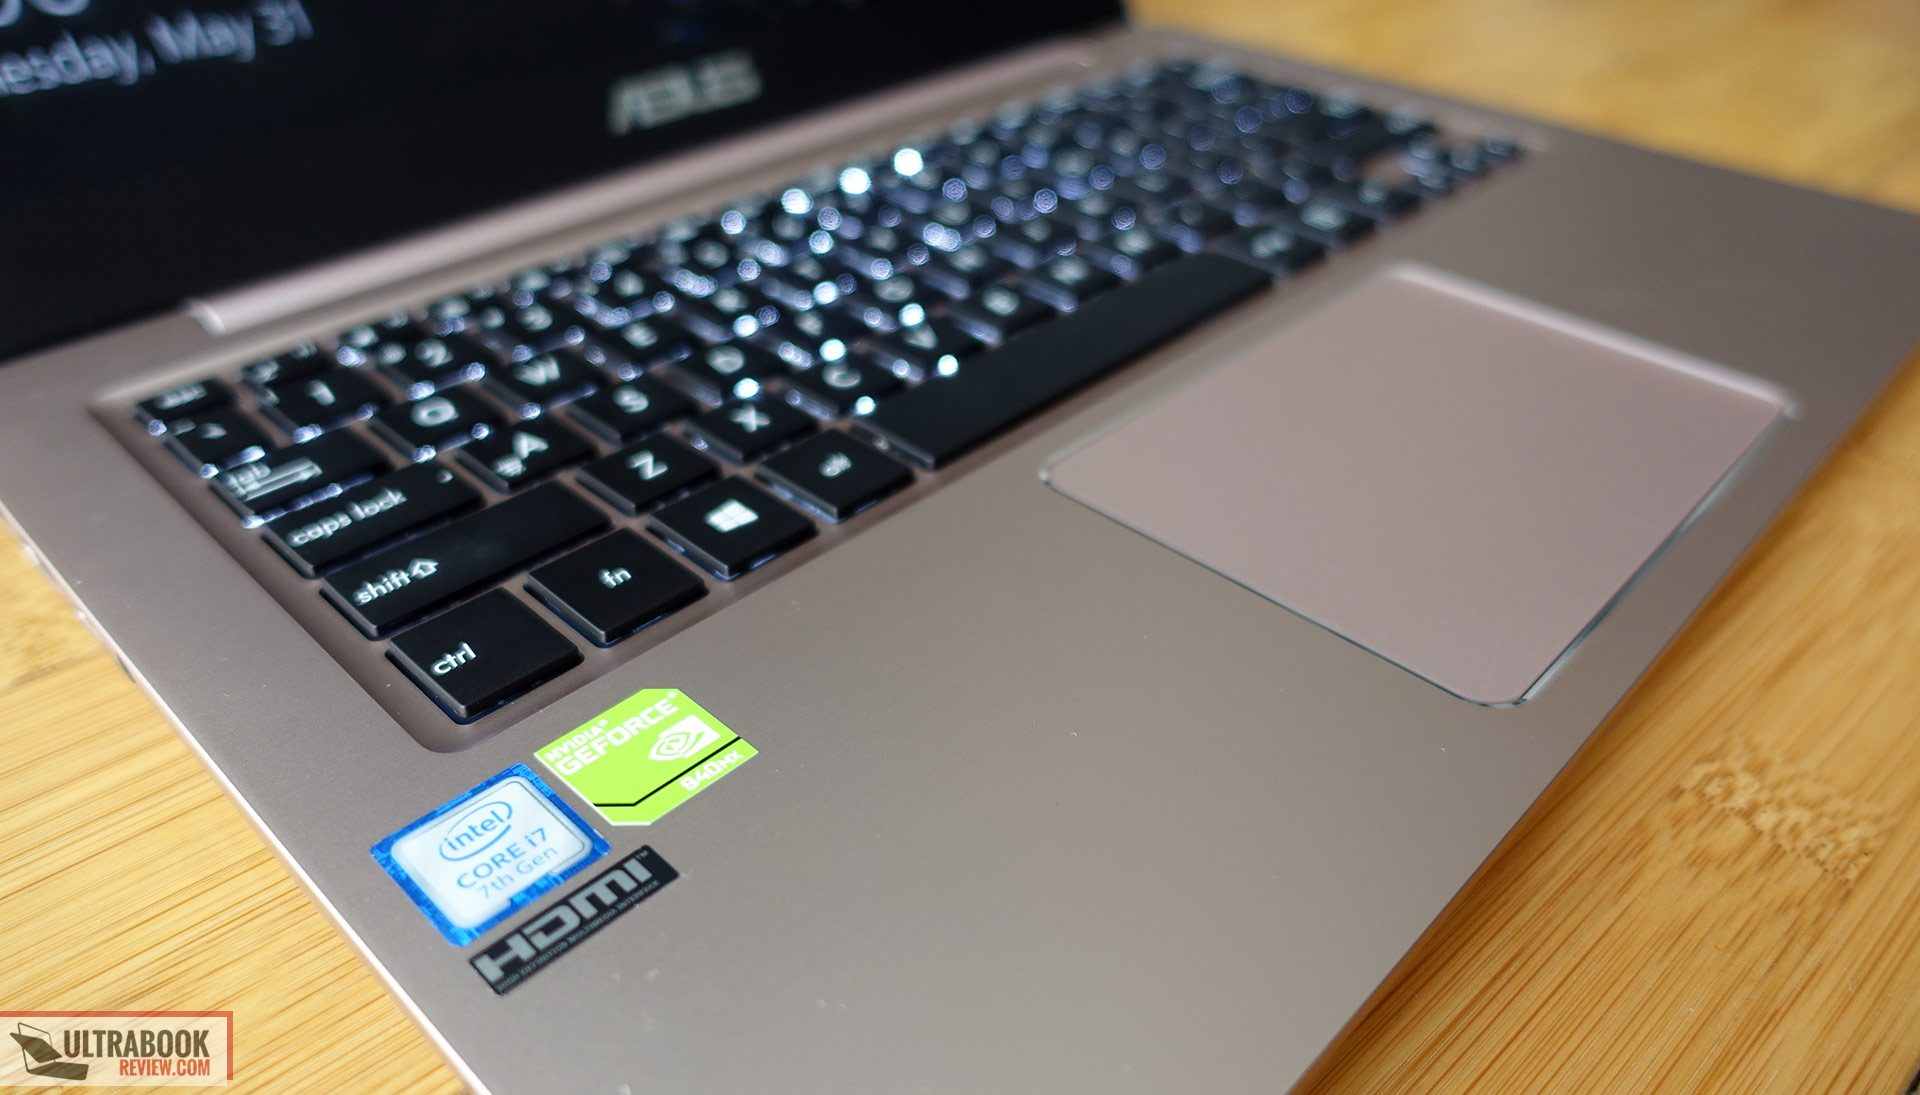 Asus Zenbook UX410UQ (UX3410UQ) review - multimedia notebook in a